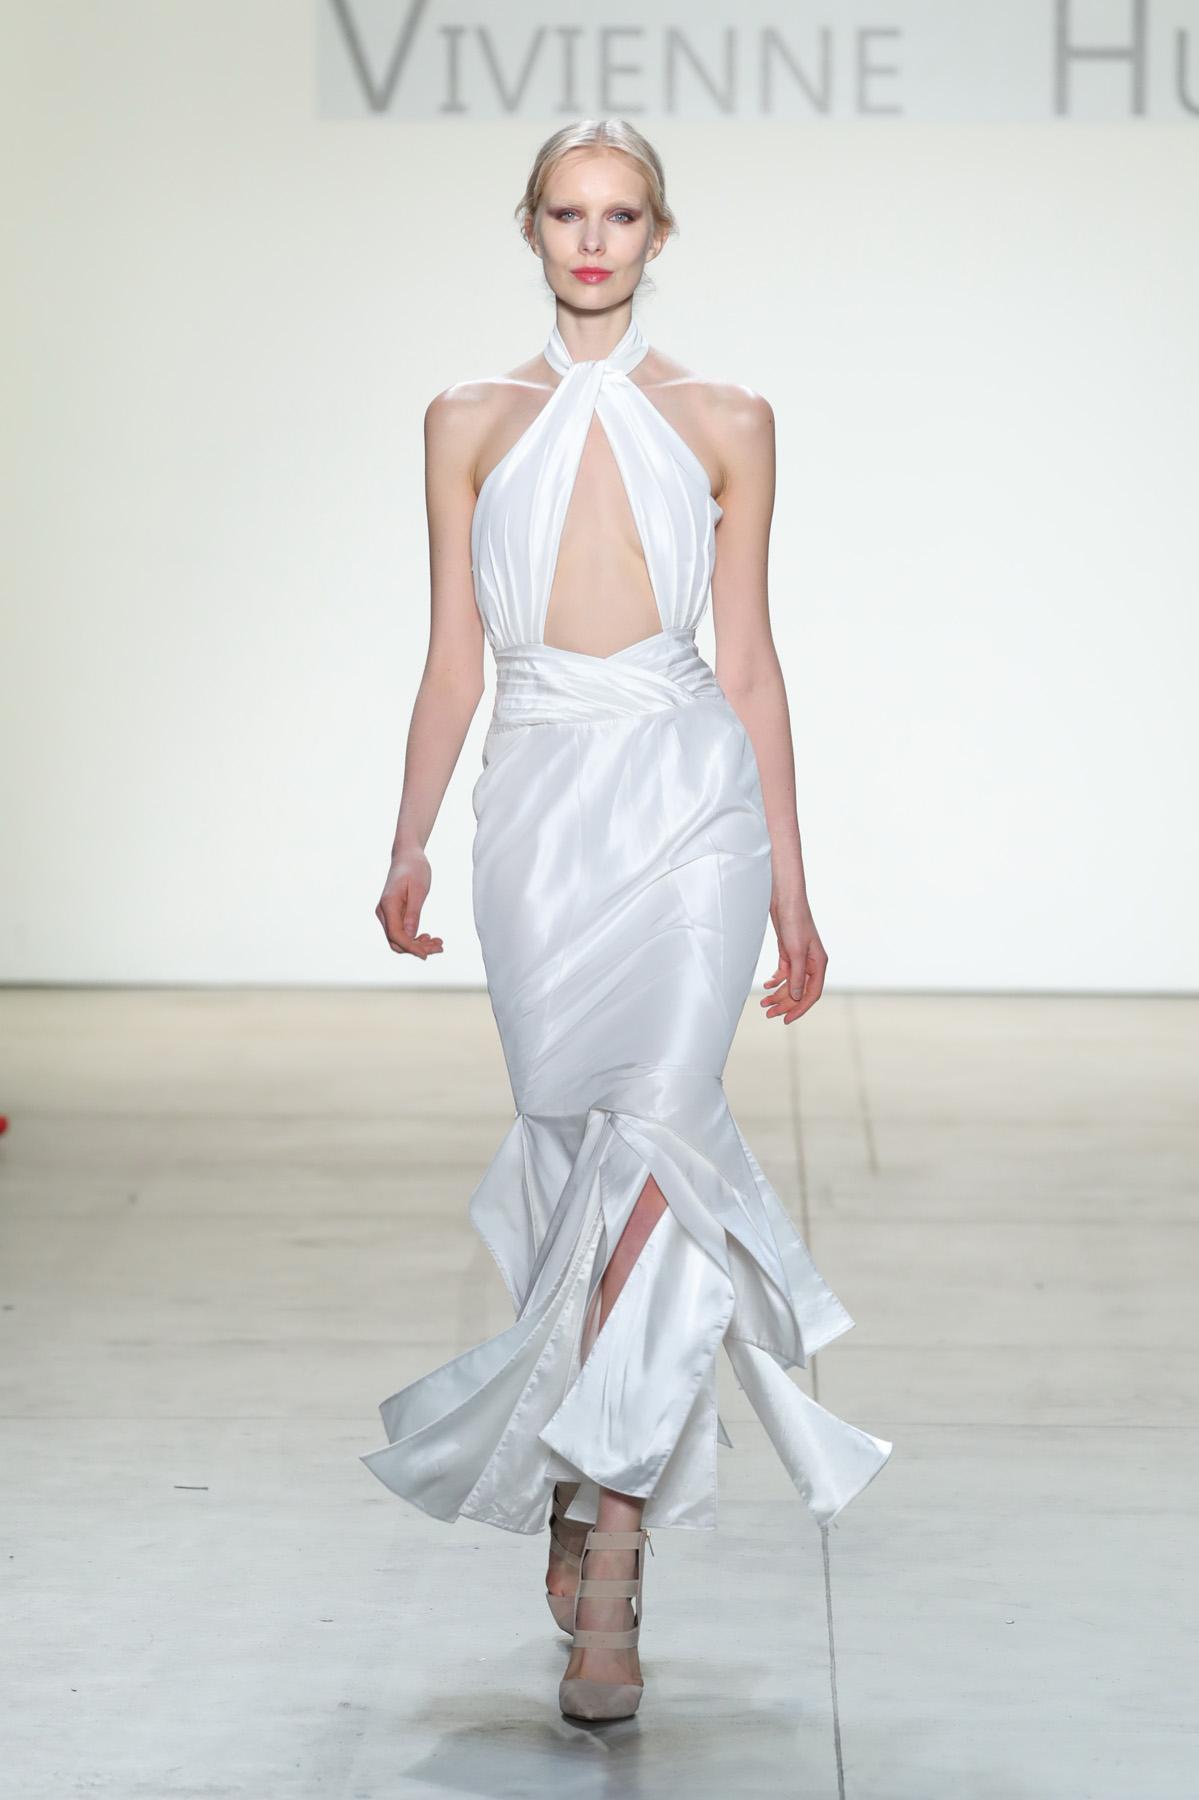 Vivienne Hu - Runway - Fall/Winter 2017 - New York Fashion Week: The Shows